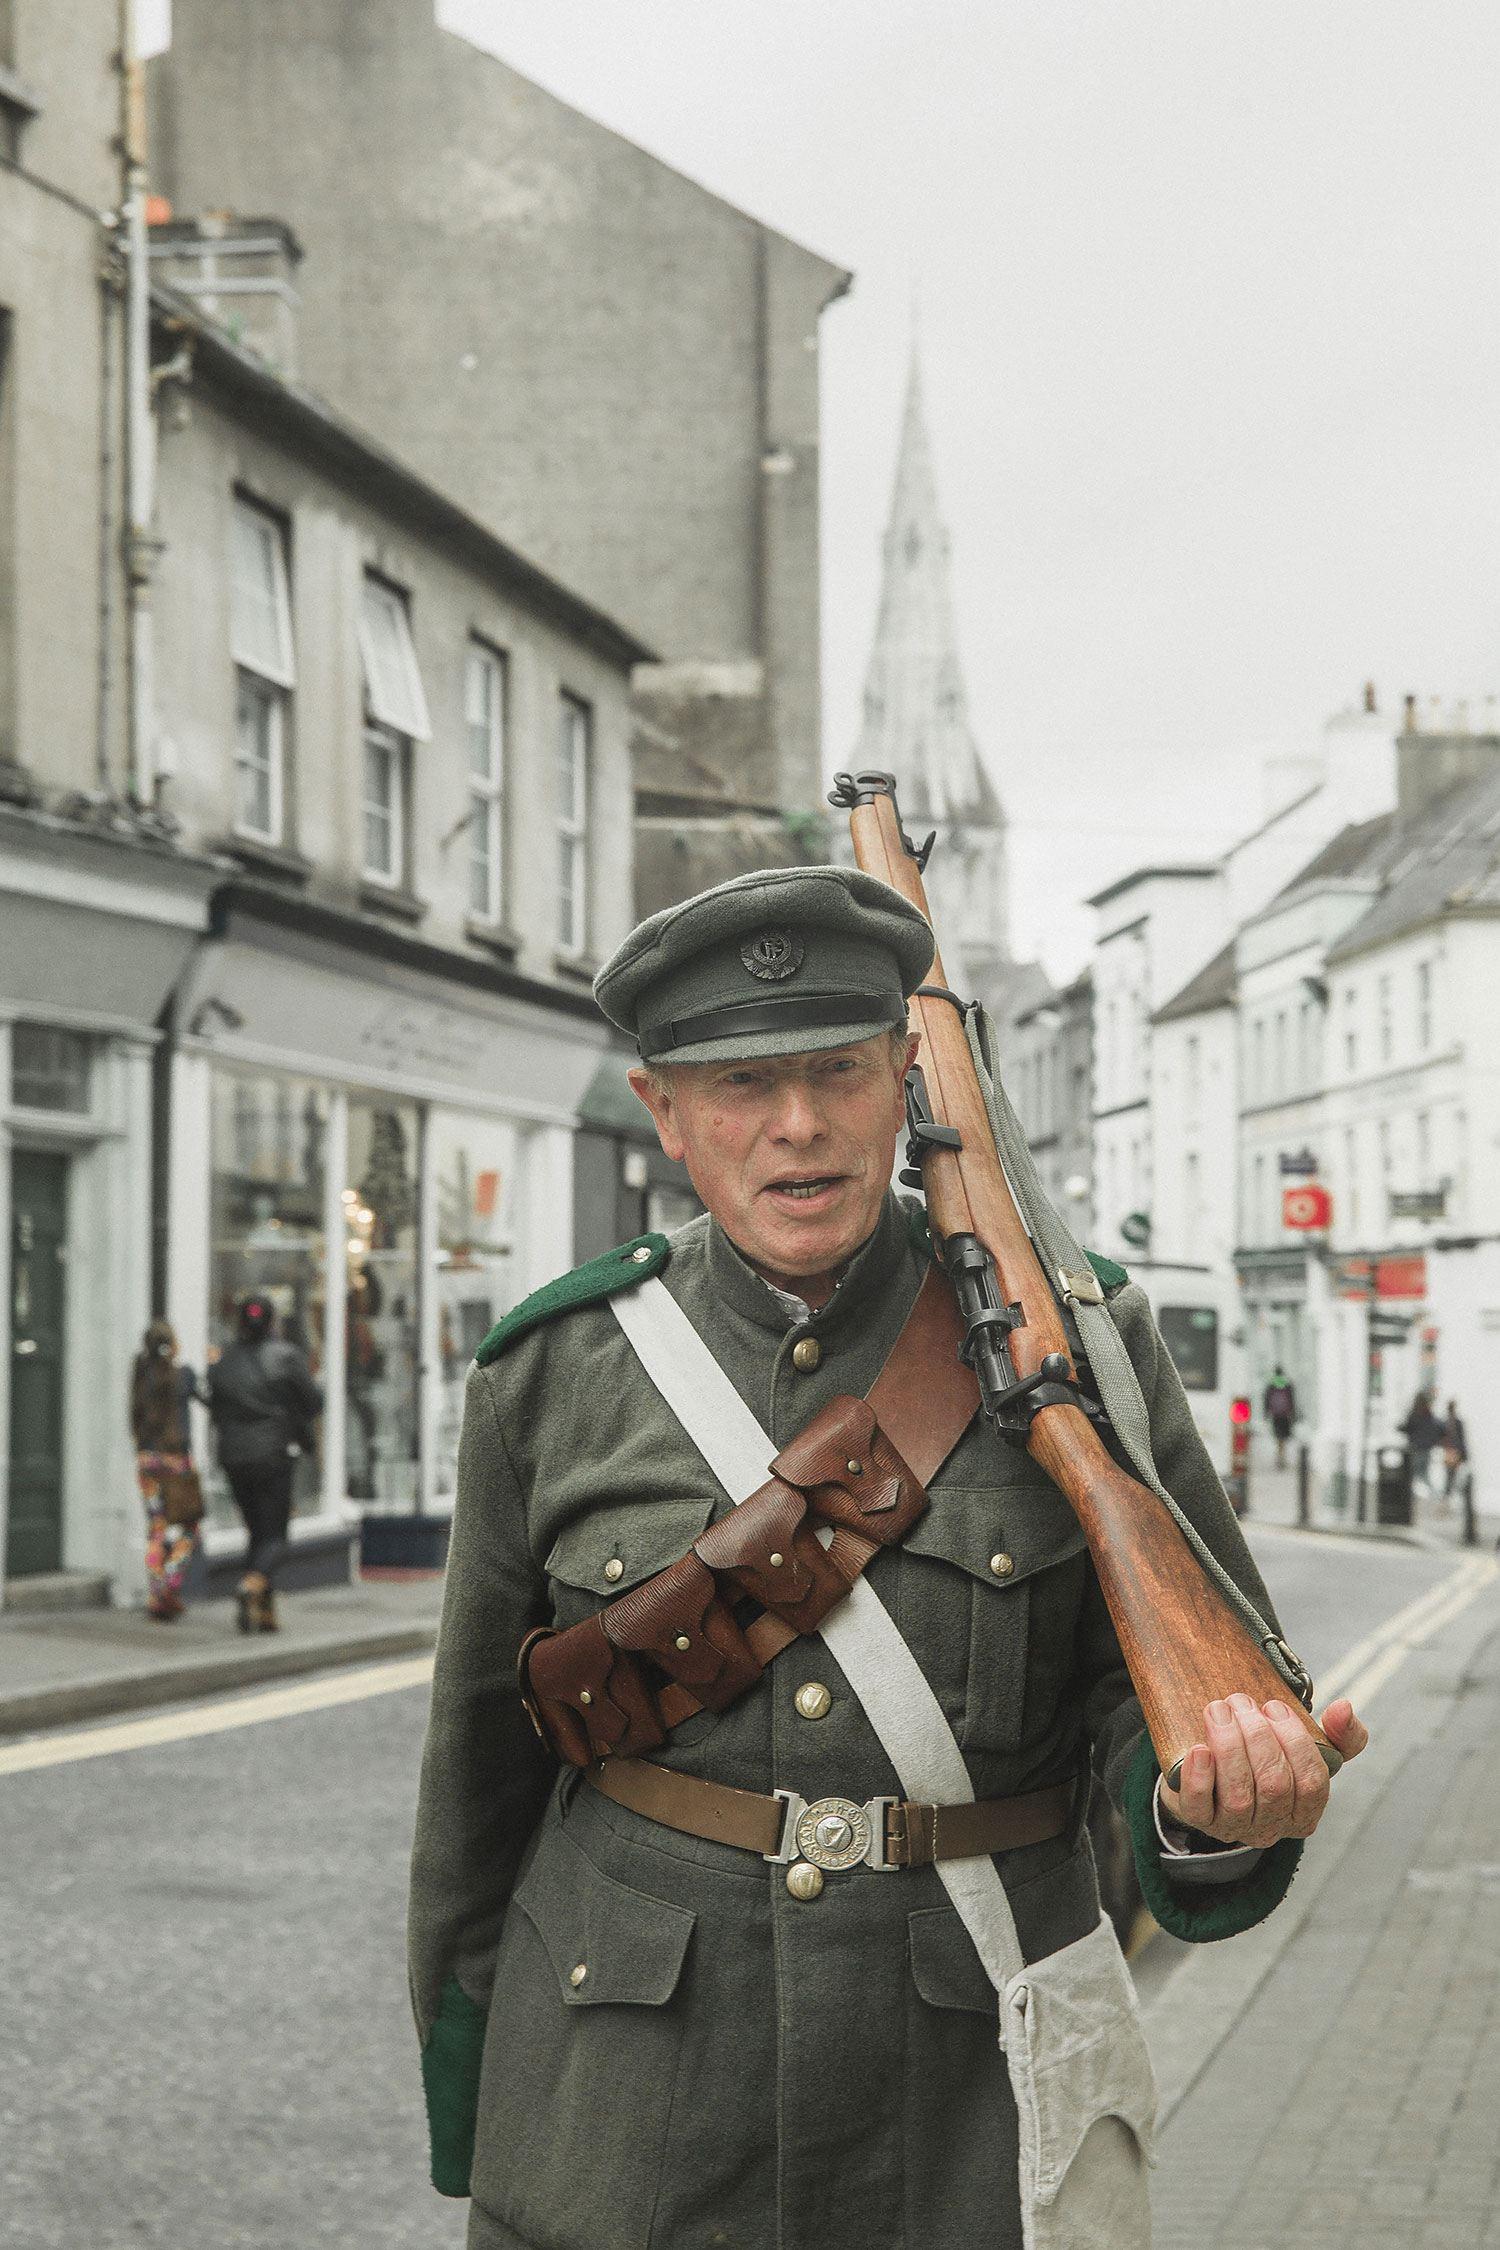 Wexford irish NRA soldiers